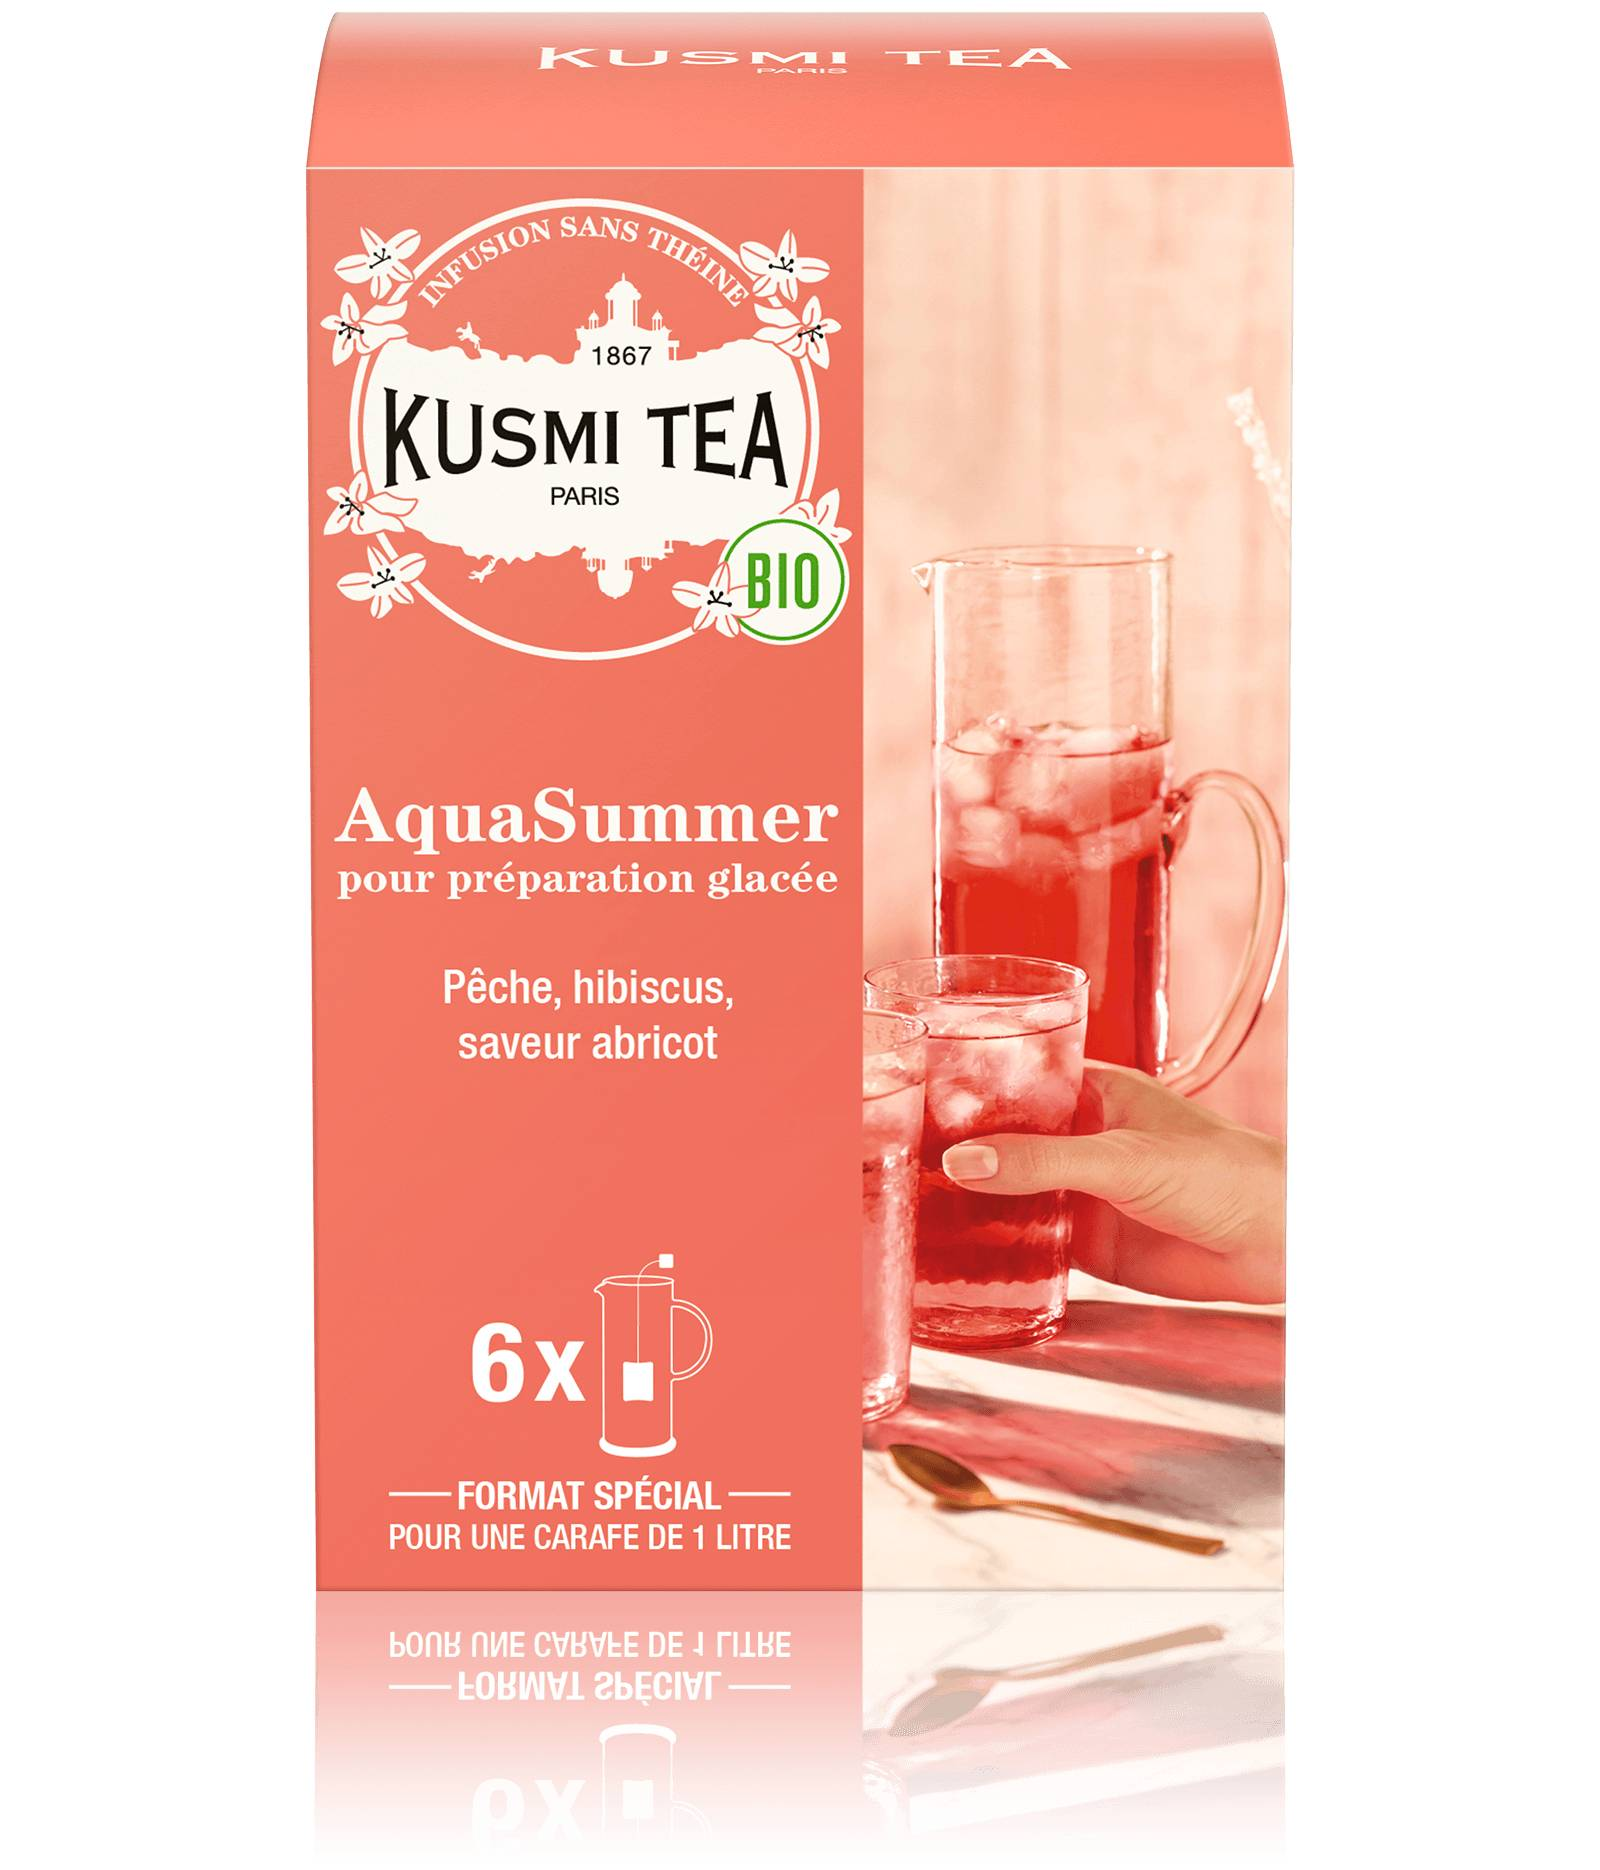 KUSMI TEA AquaSummer (Infusion de fruits bio) - Infusion hibiscus, pêche, abricot - Sachets de thé - Kusmi Tea